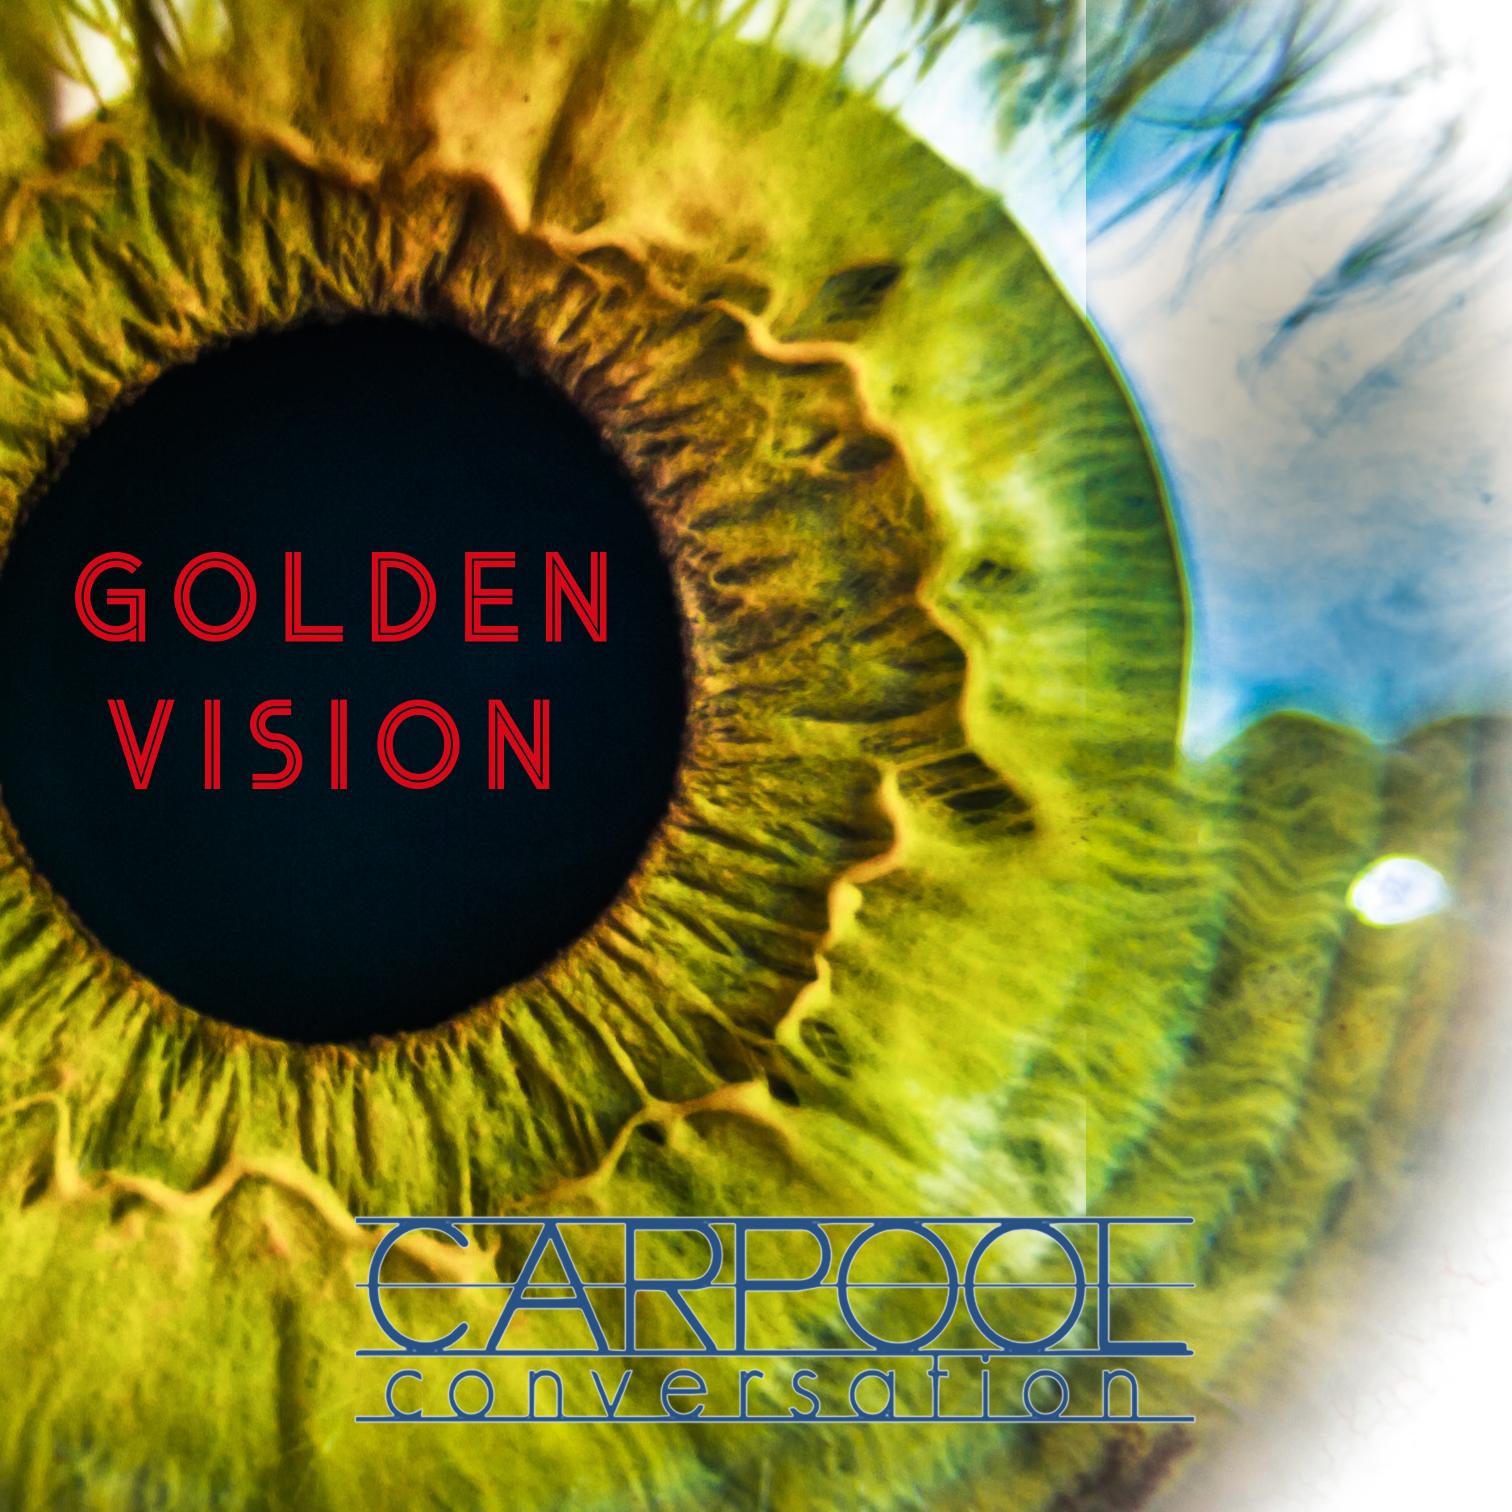 Golden Vision download - Carpool Conversation